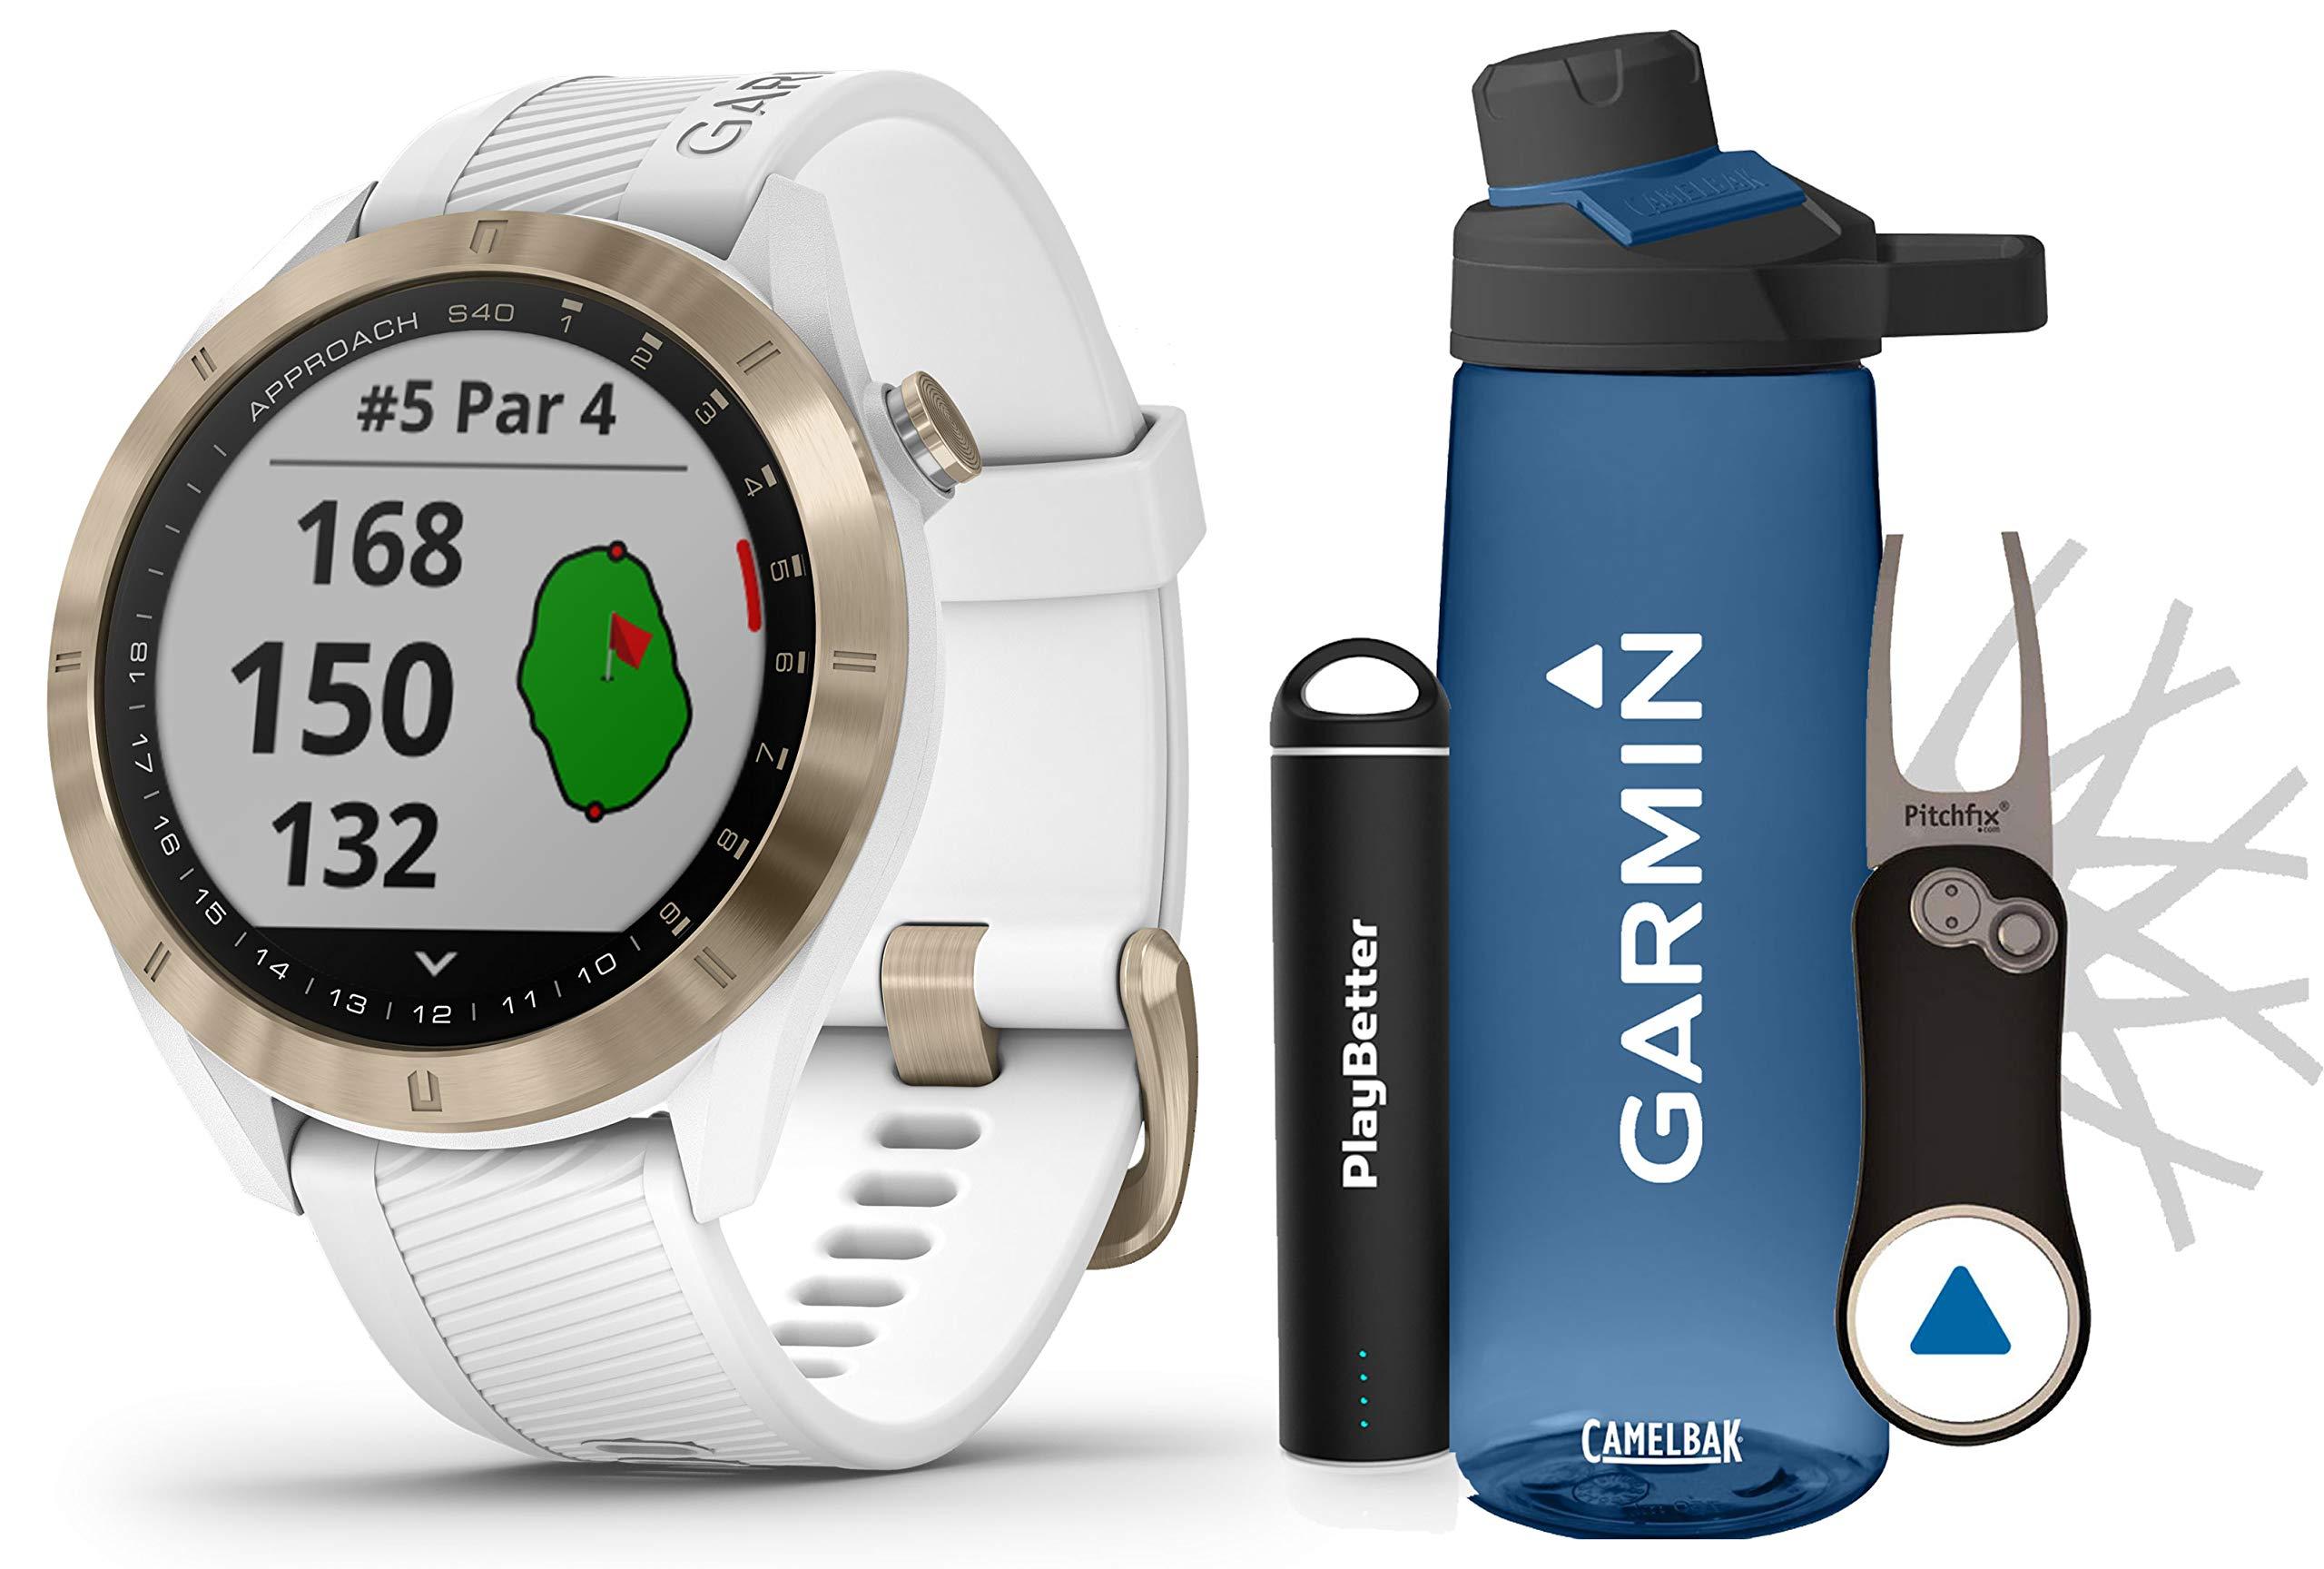 Garmin Approach S40 (Rose Gold) Golf GPS Smartwatch Premium Gift Set Bundle   +HD Screen Protectors, Garmin/PlayBetter Premium Water Bottle, Pitchfix Divot Tool & Portable Charger   41,000+ Courses